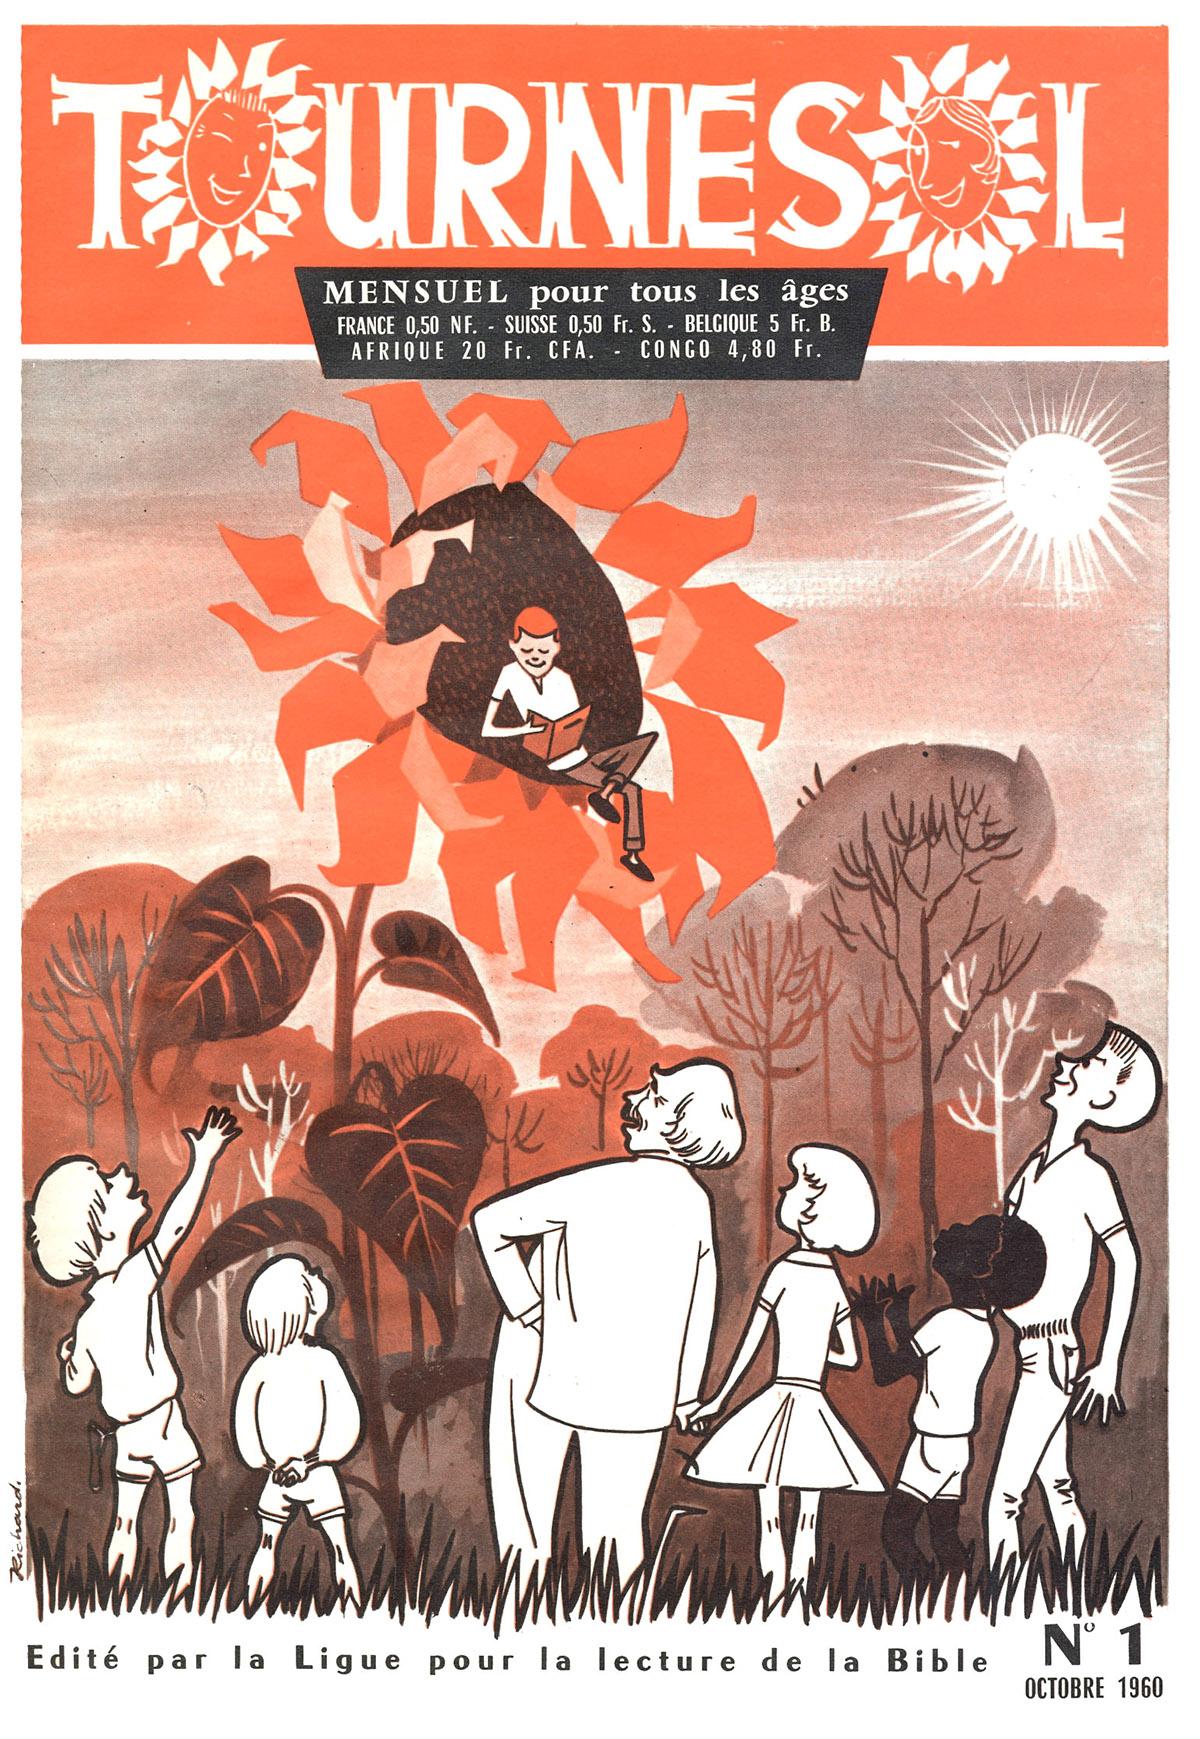 Tournesol - 1960